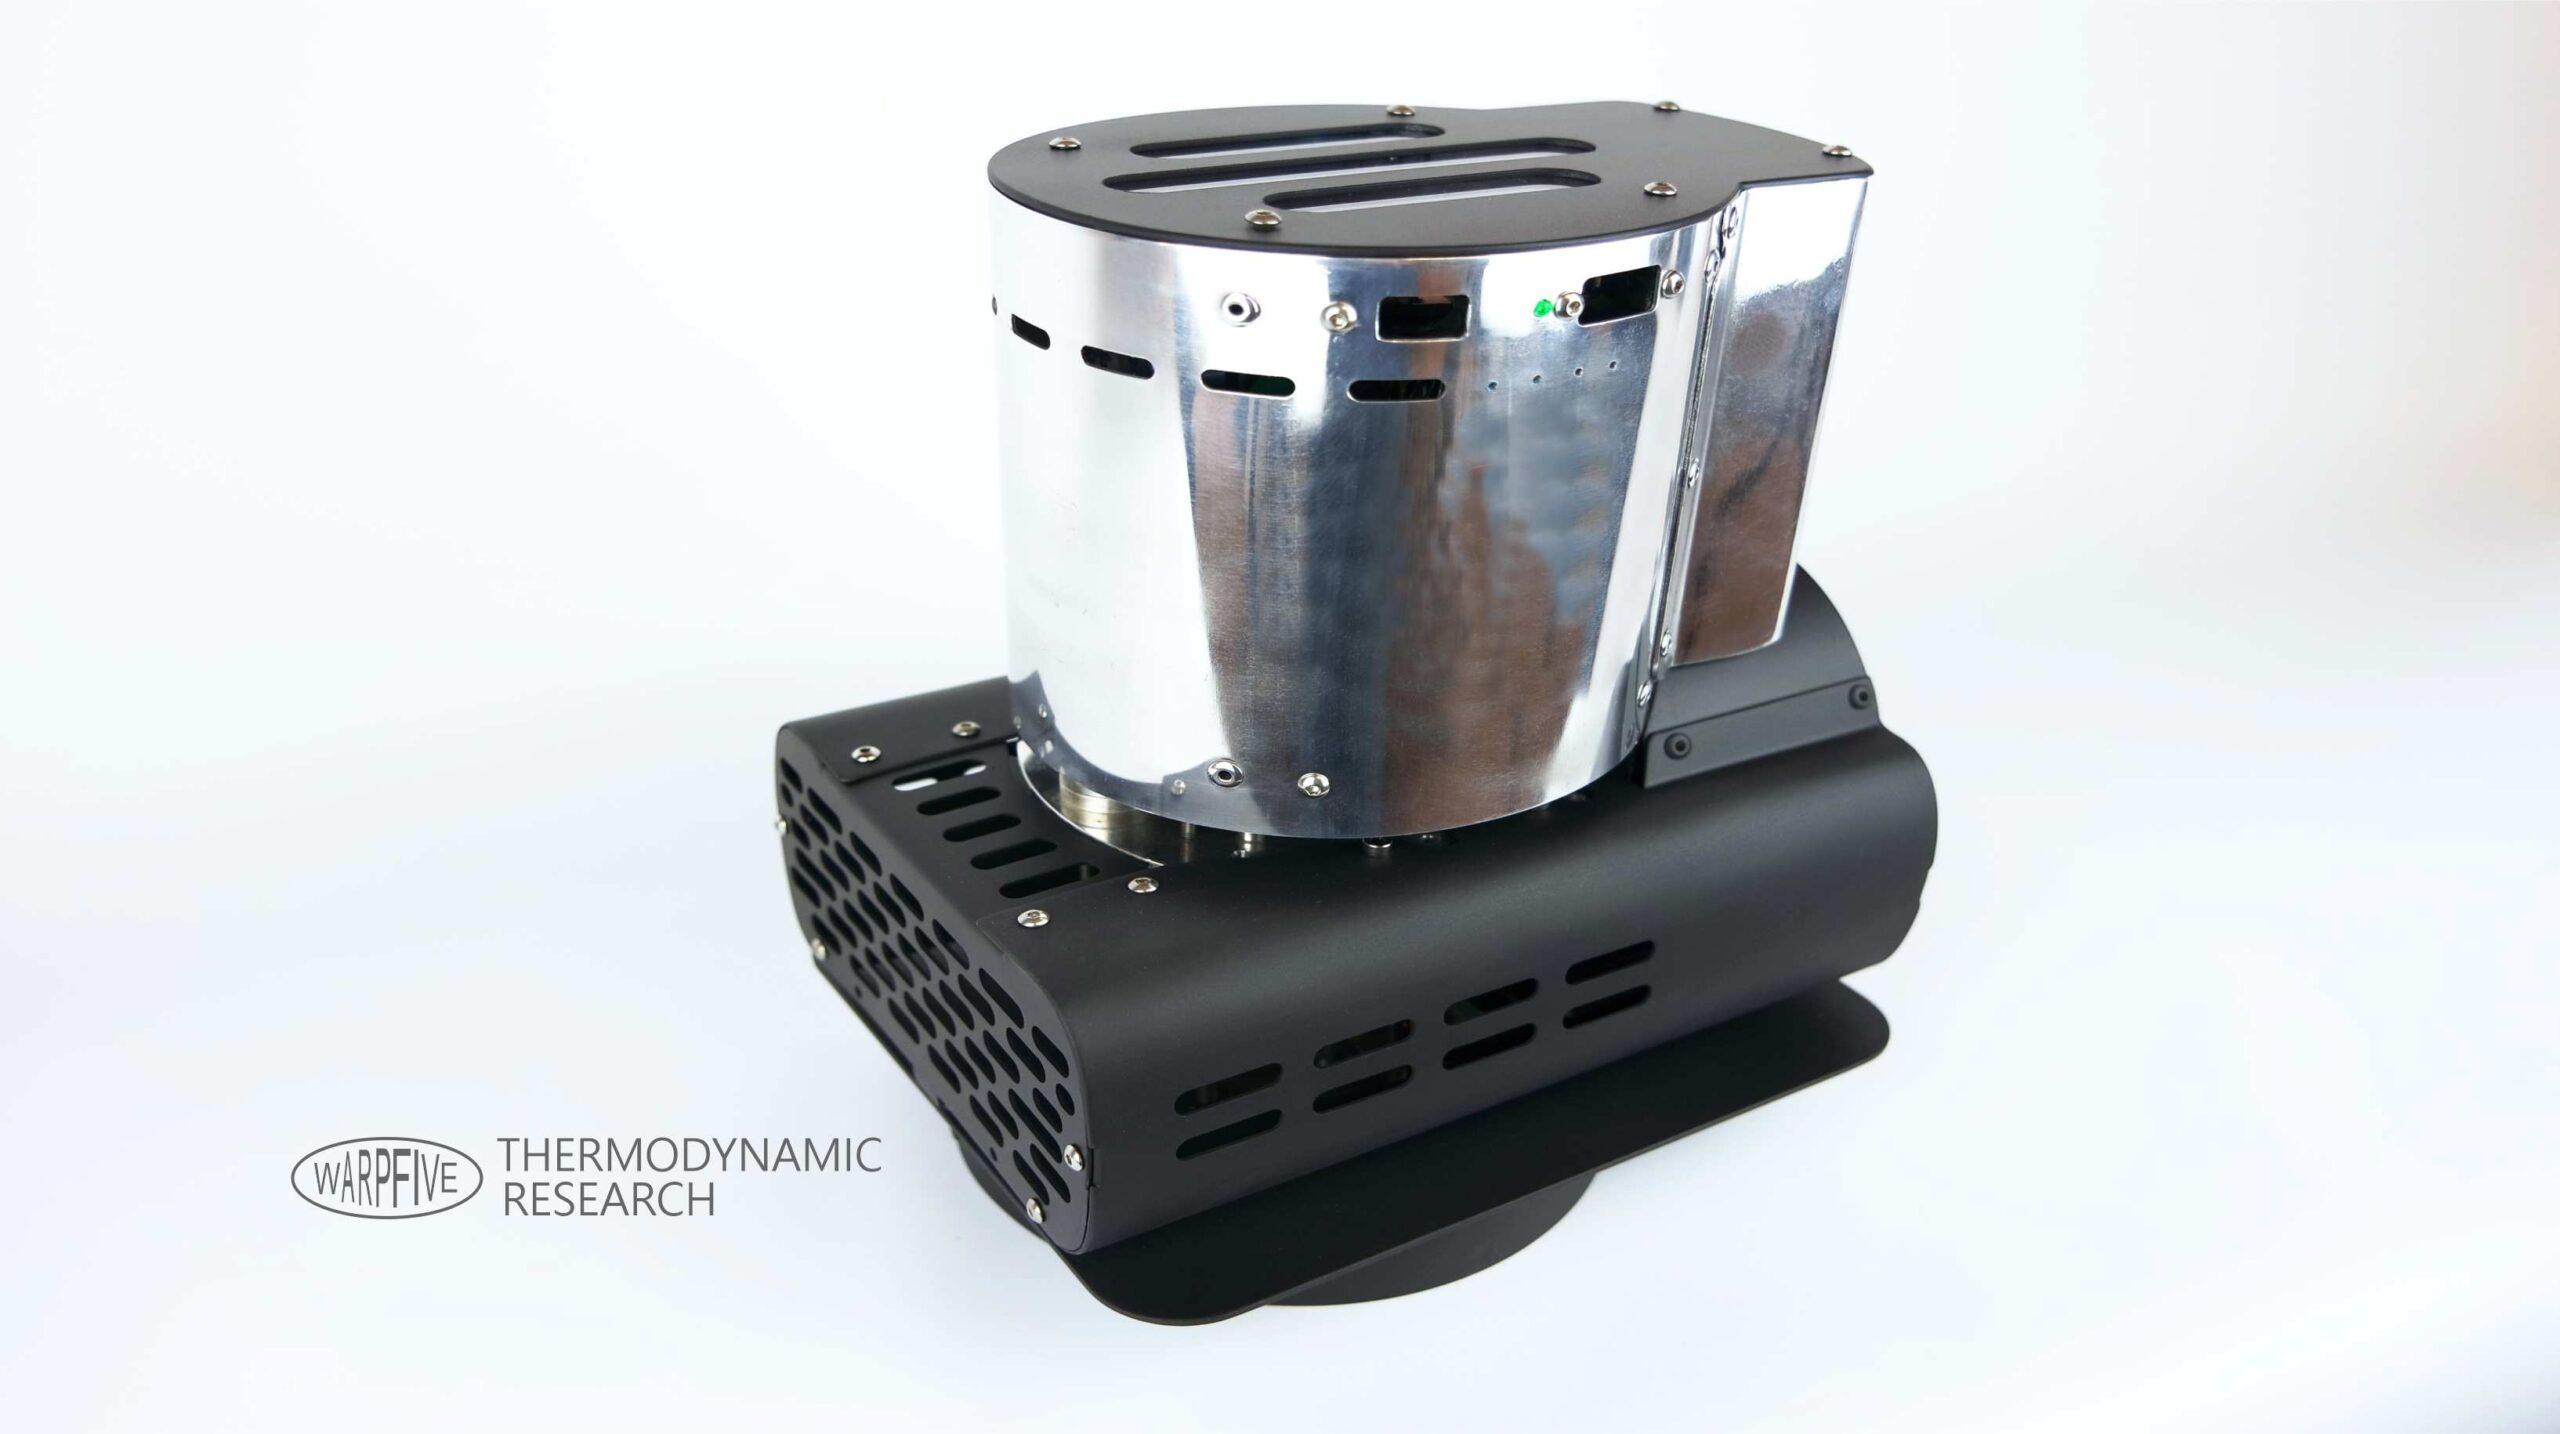 Warpfive experimental single cylinder Stirling engine air-cooled generator